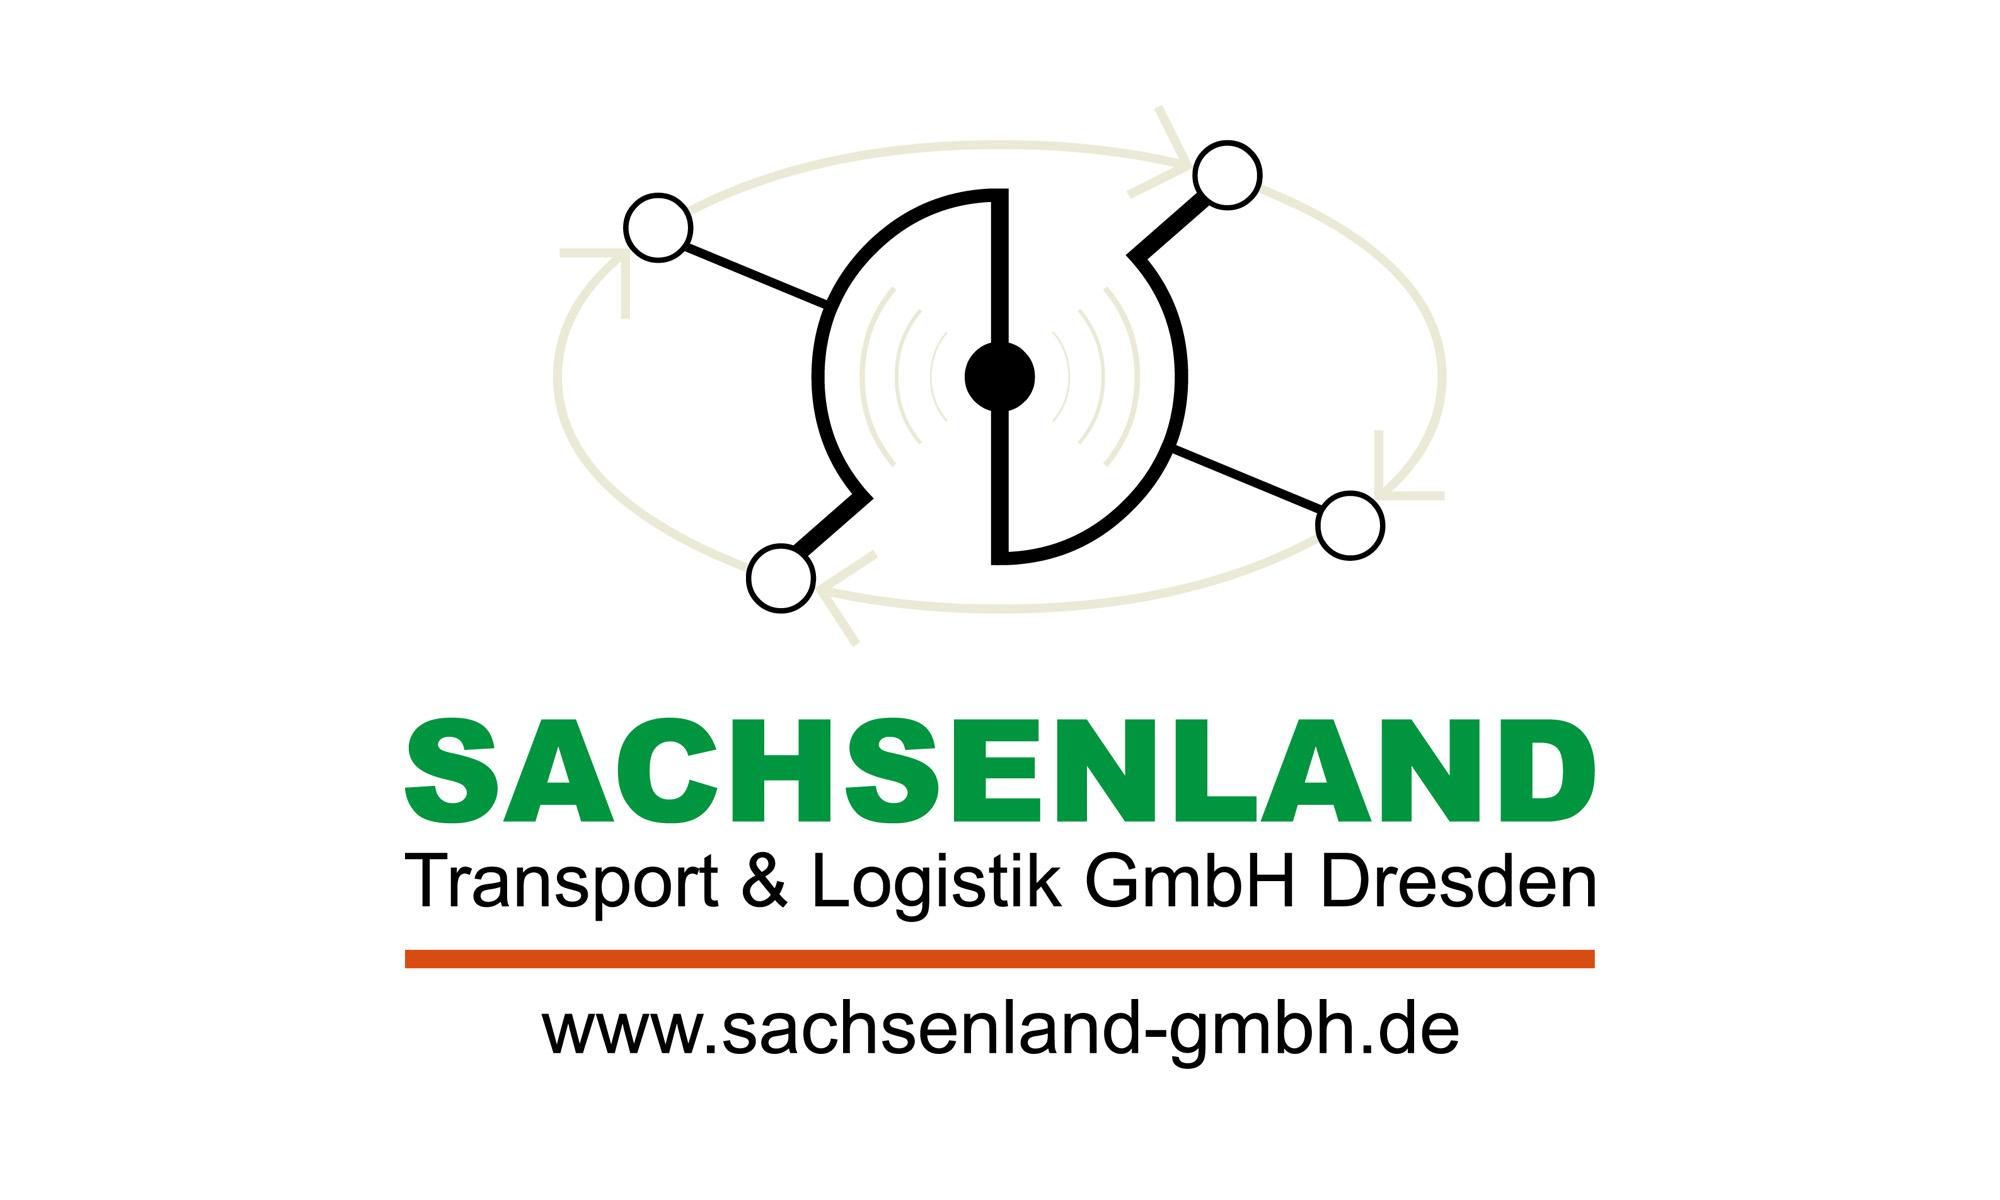 Sachsenland Transport & Logistik GmbH